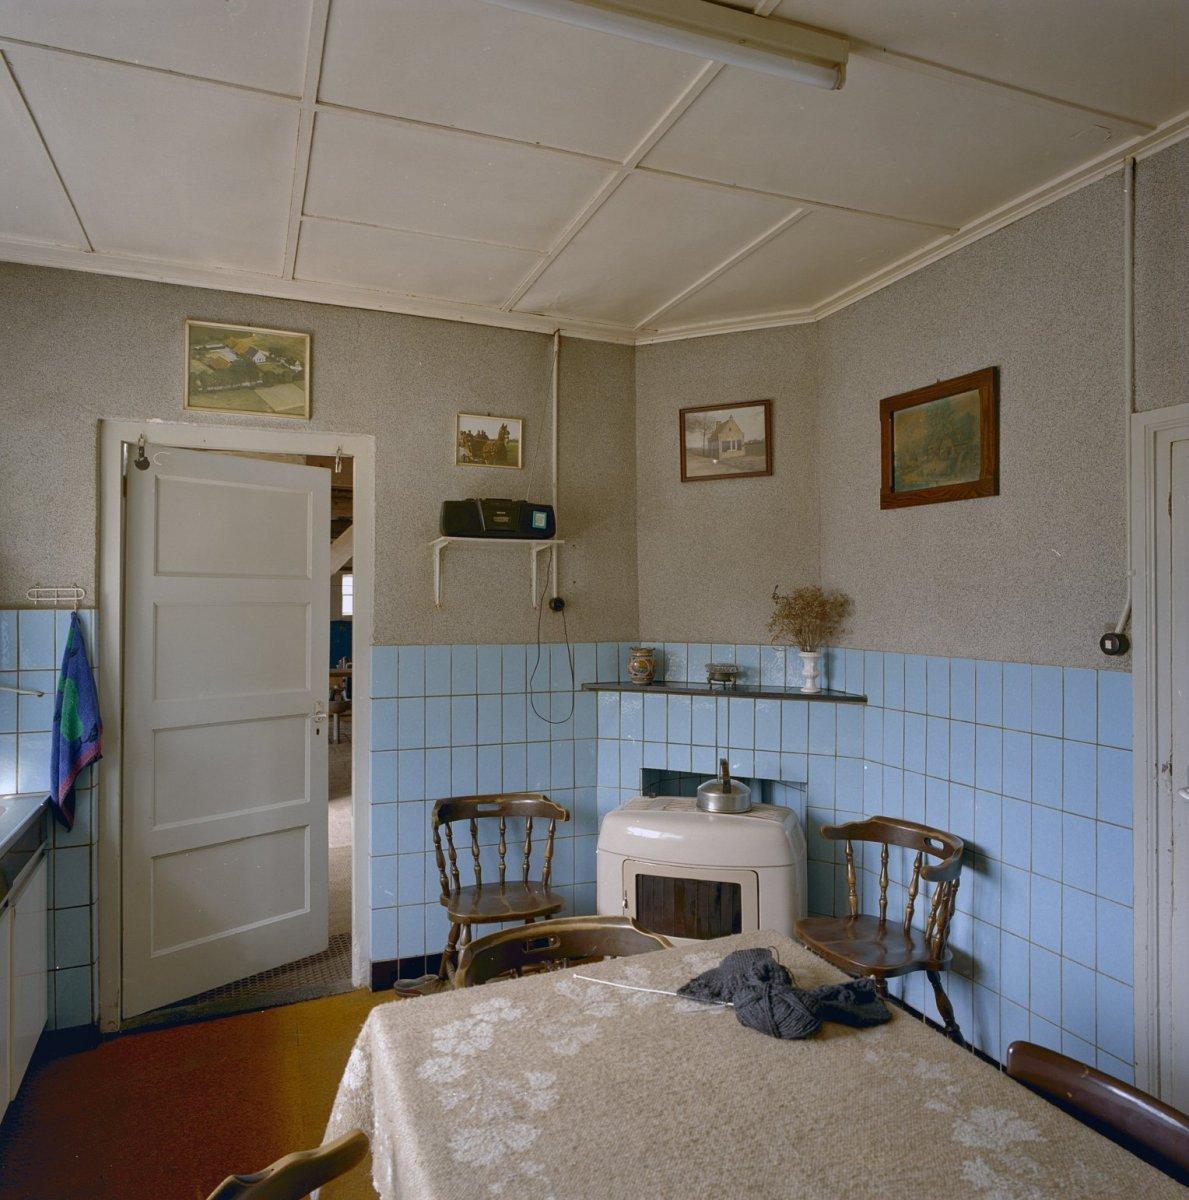 File:Interieur, keuken met lambrizering van blauwe wandtegels - Breda ...